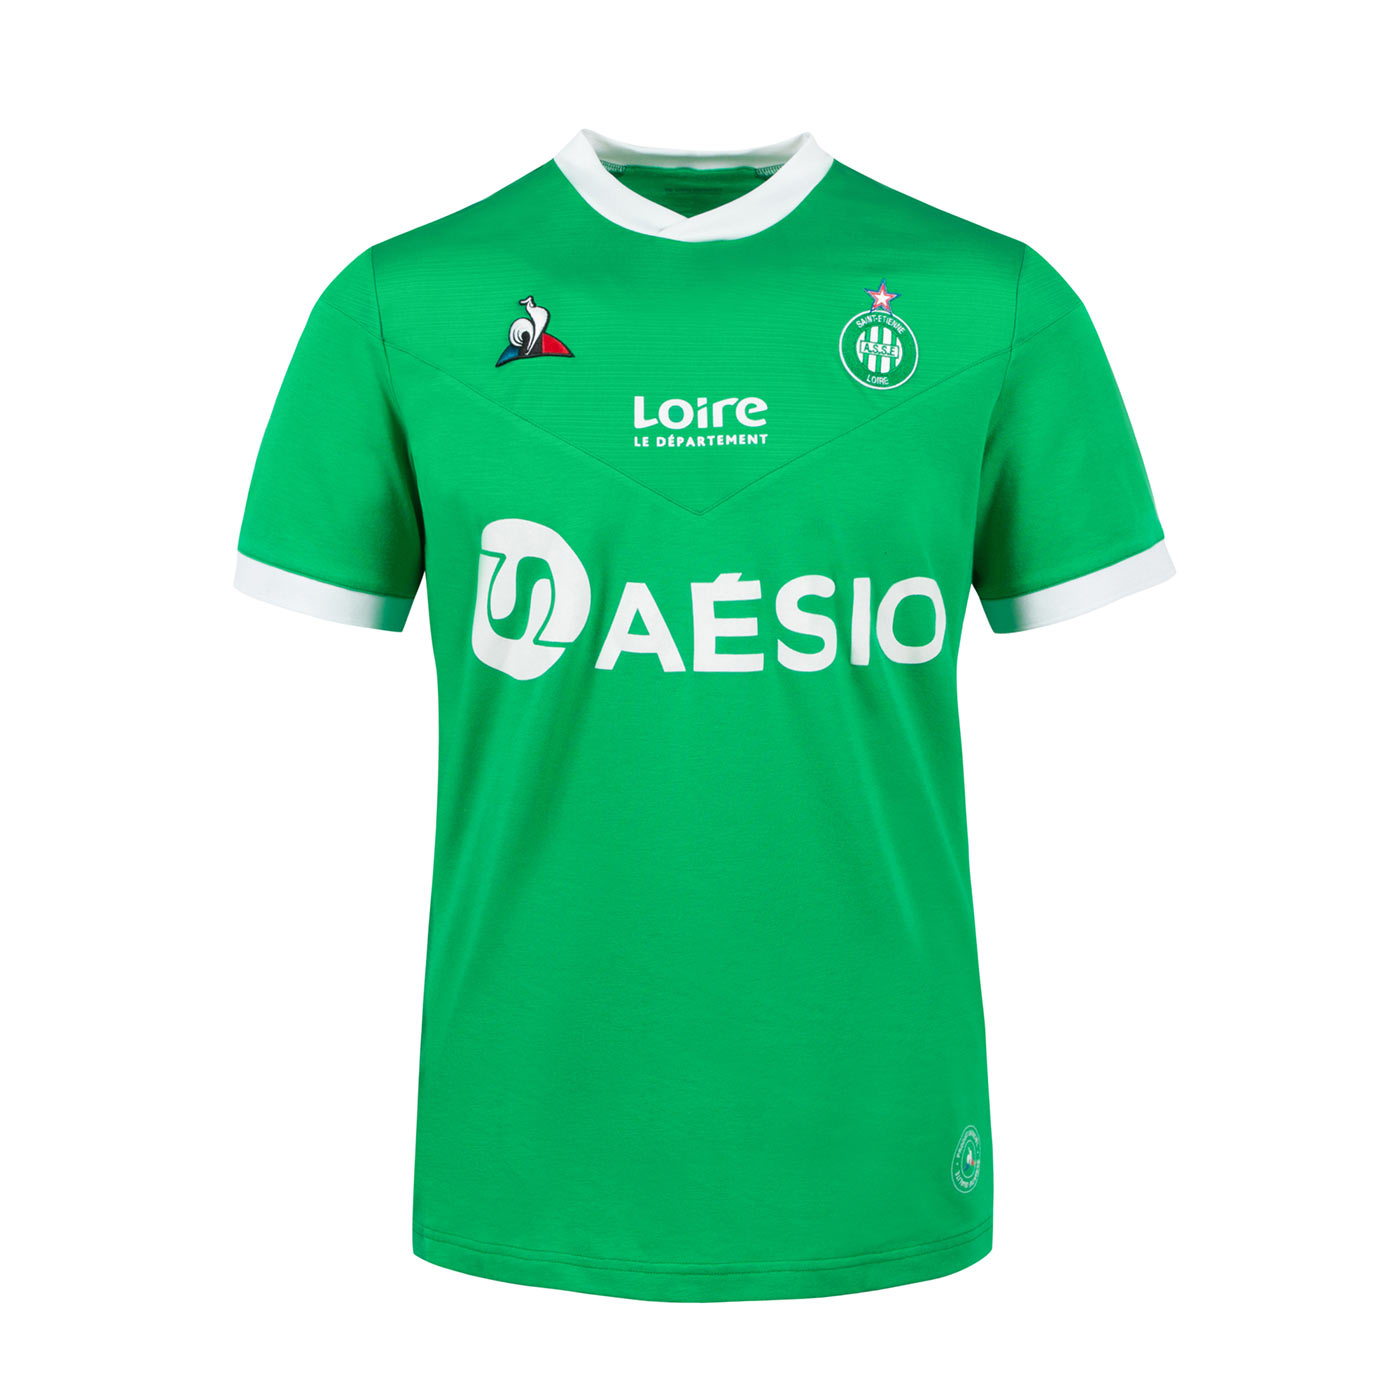 Maglie Saint-Etienne 2020-2021, l'armatura firmata Le Coq Sportif